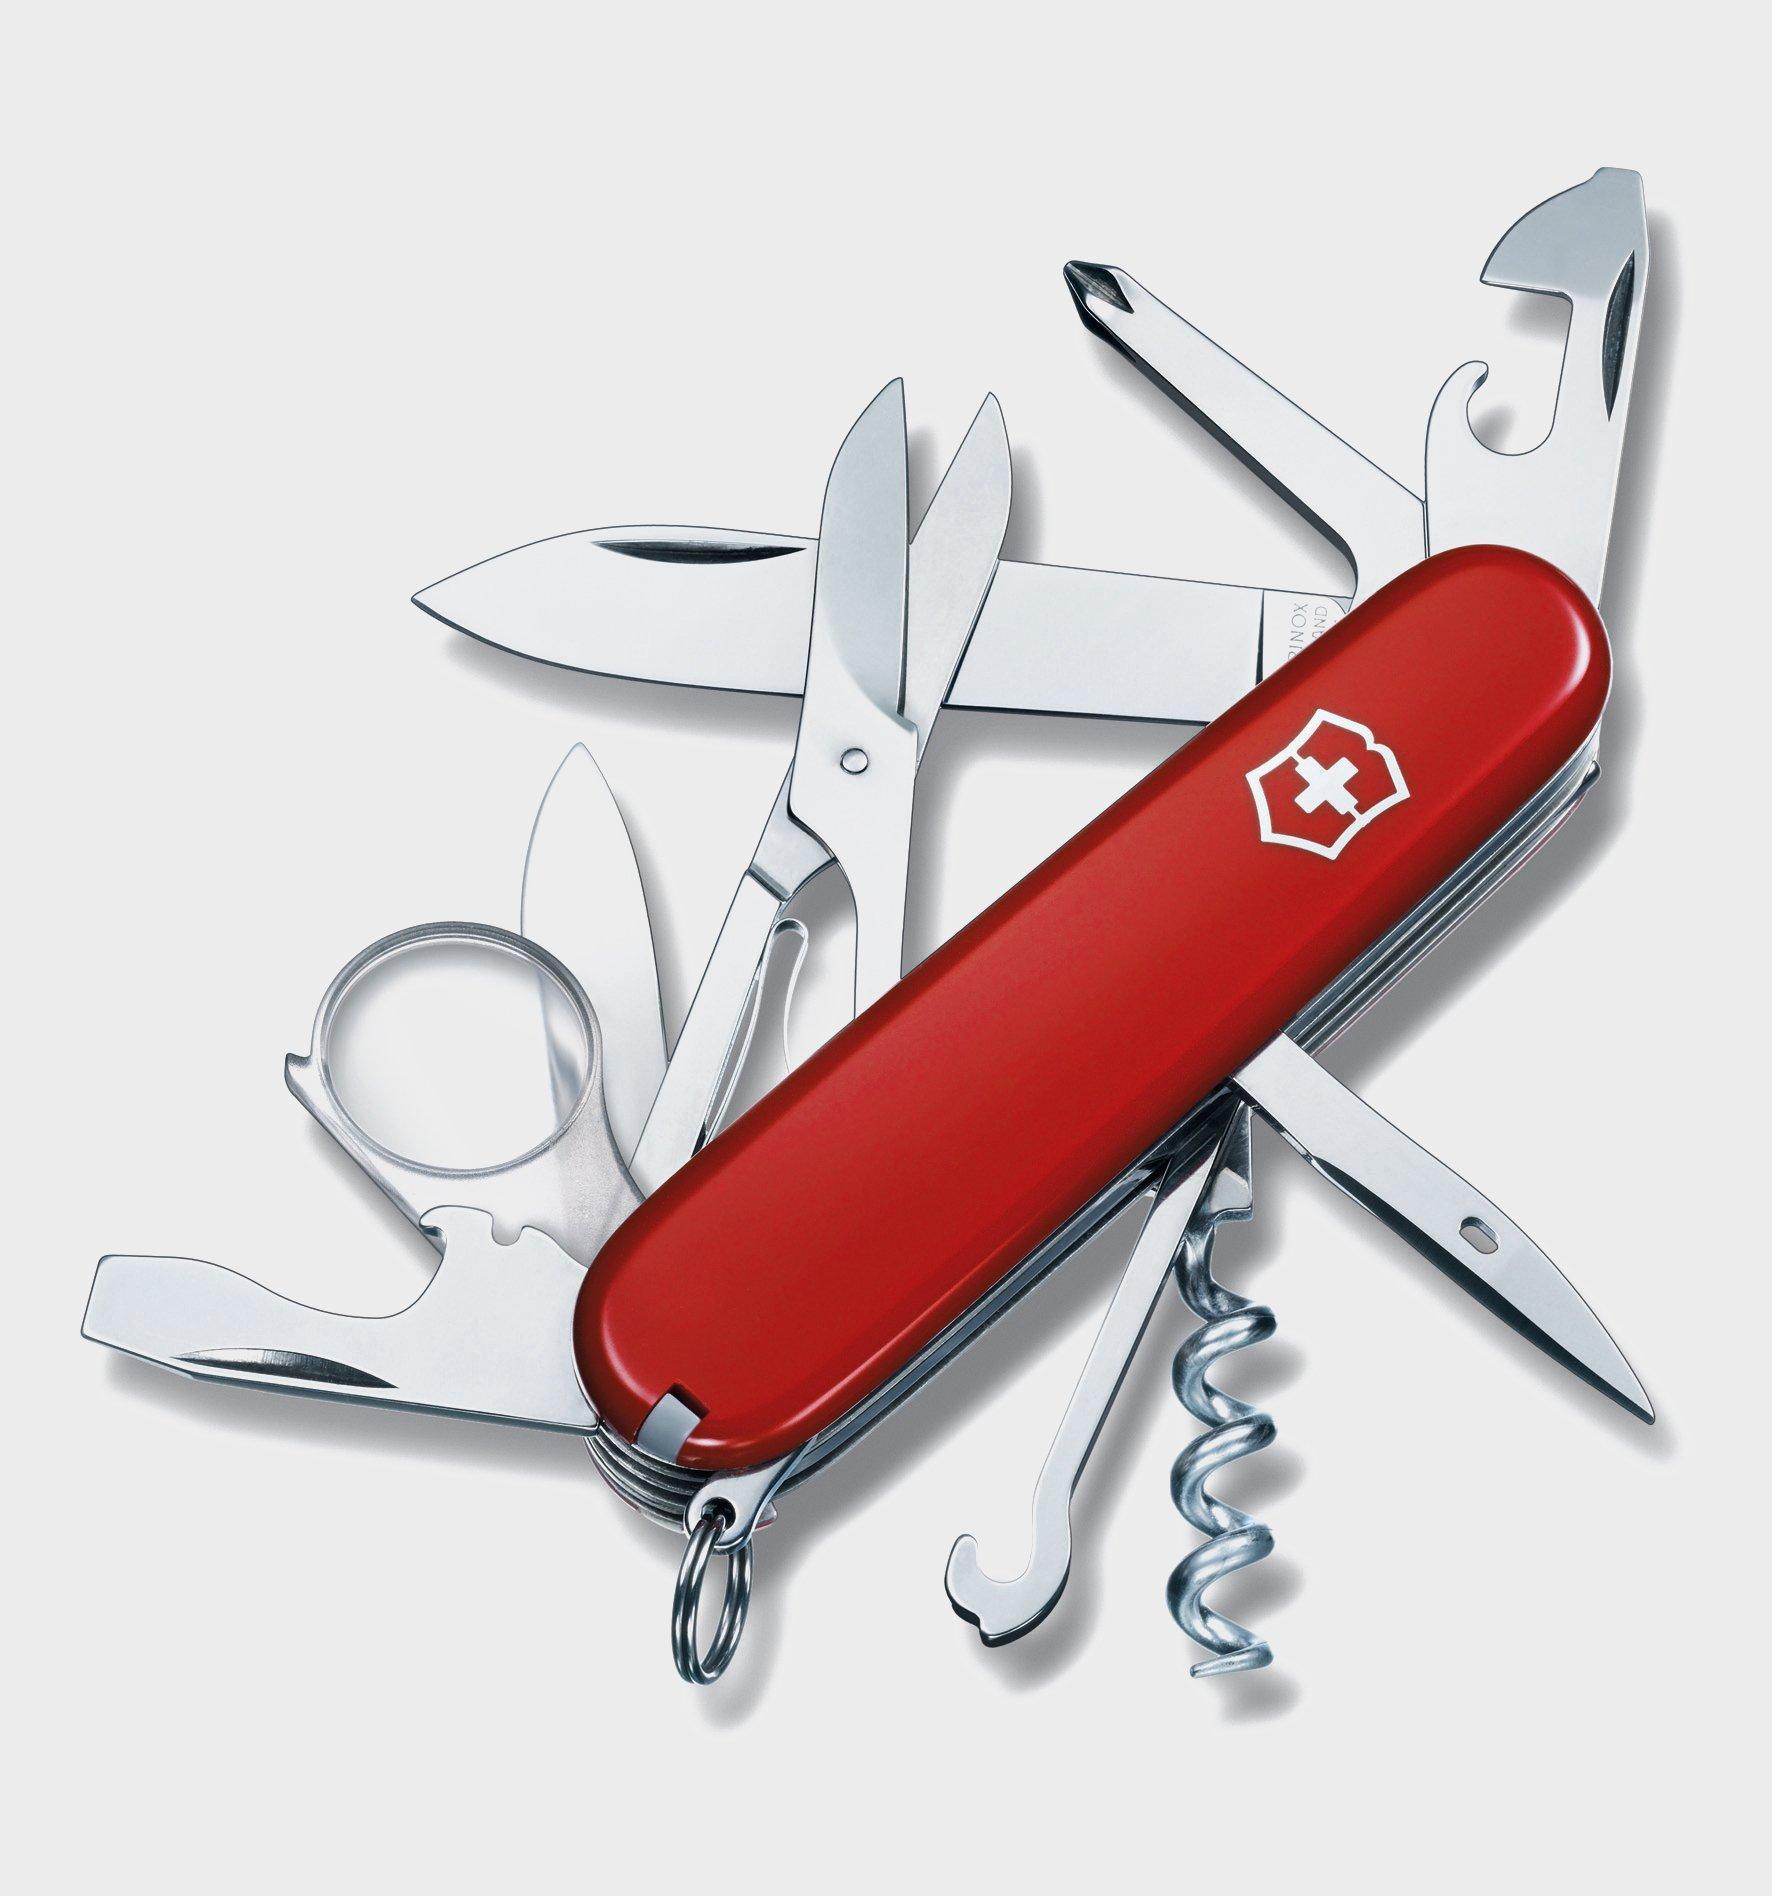 Victorinox Victorinox Explorer Pocket Knife - Red, Red